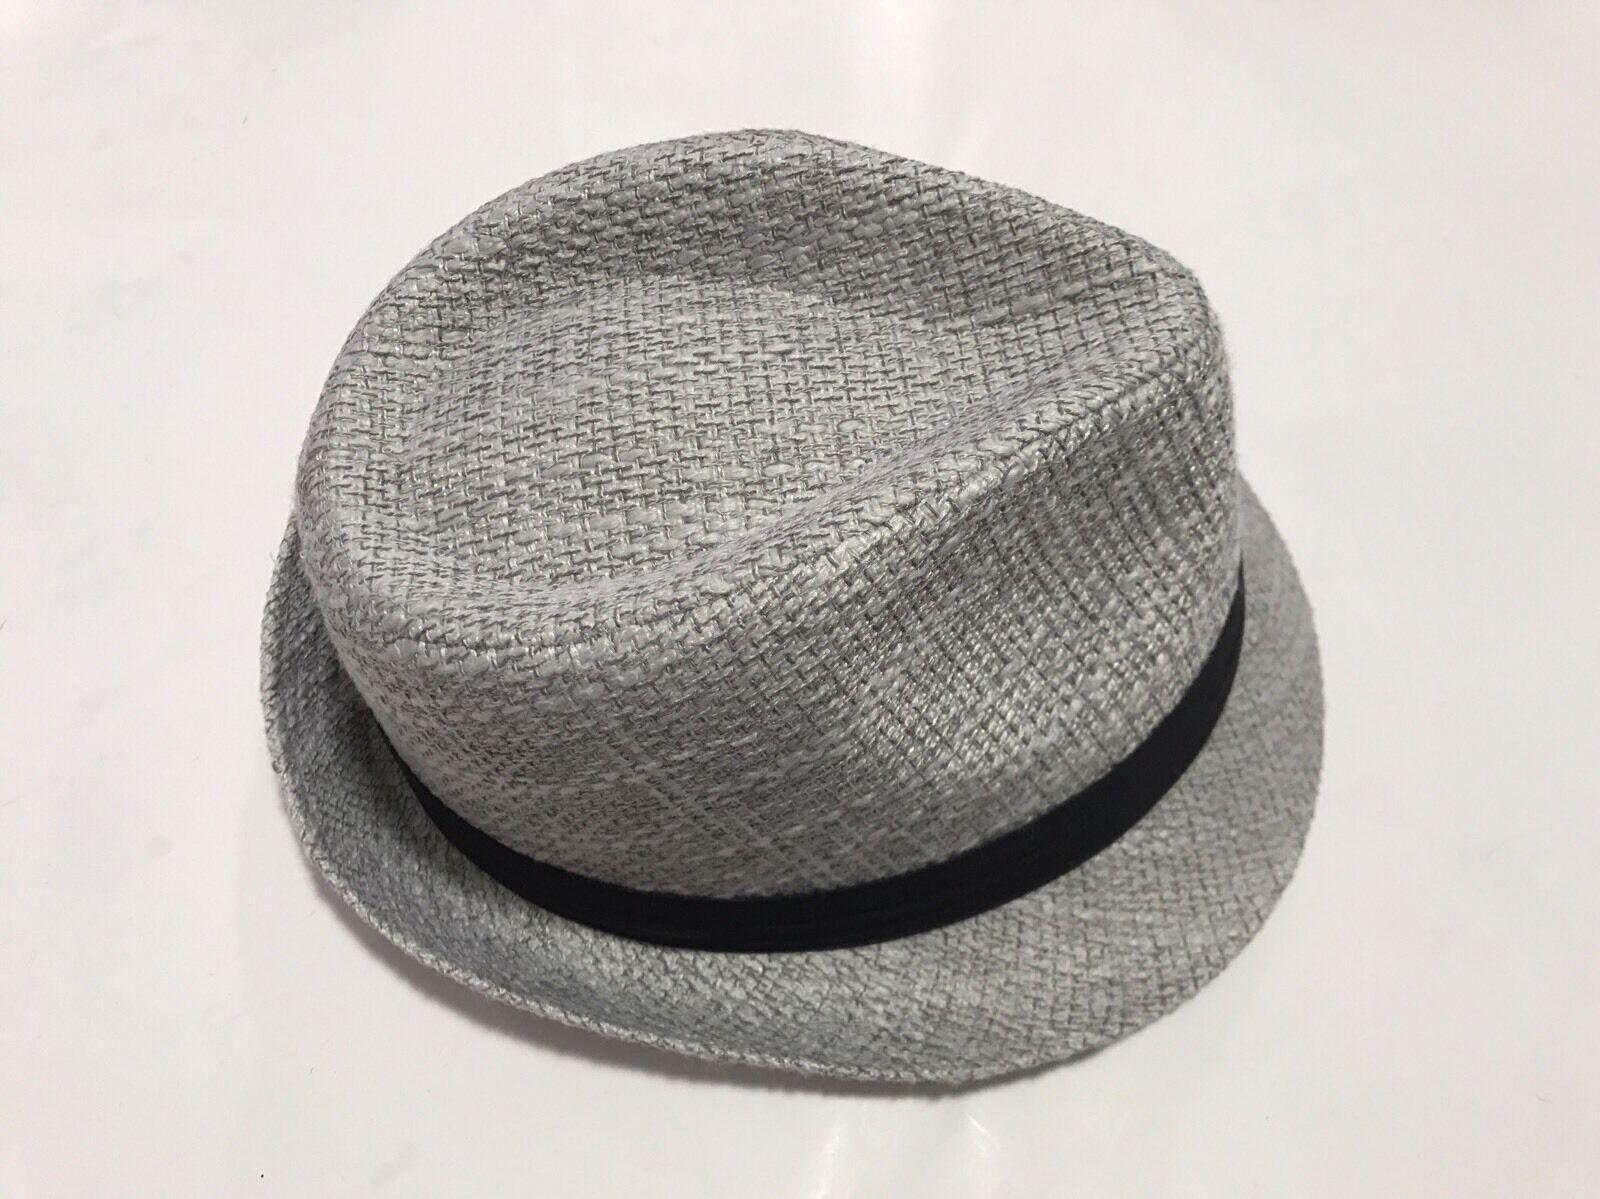 Bruno Conte's 100% Polyester Men's Men's Men's Fedora Silver Hat Large Size 4c57a9